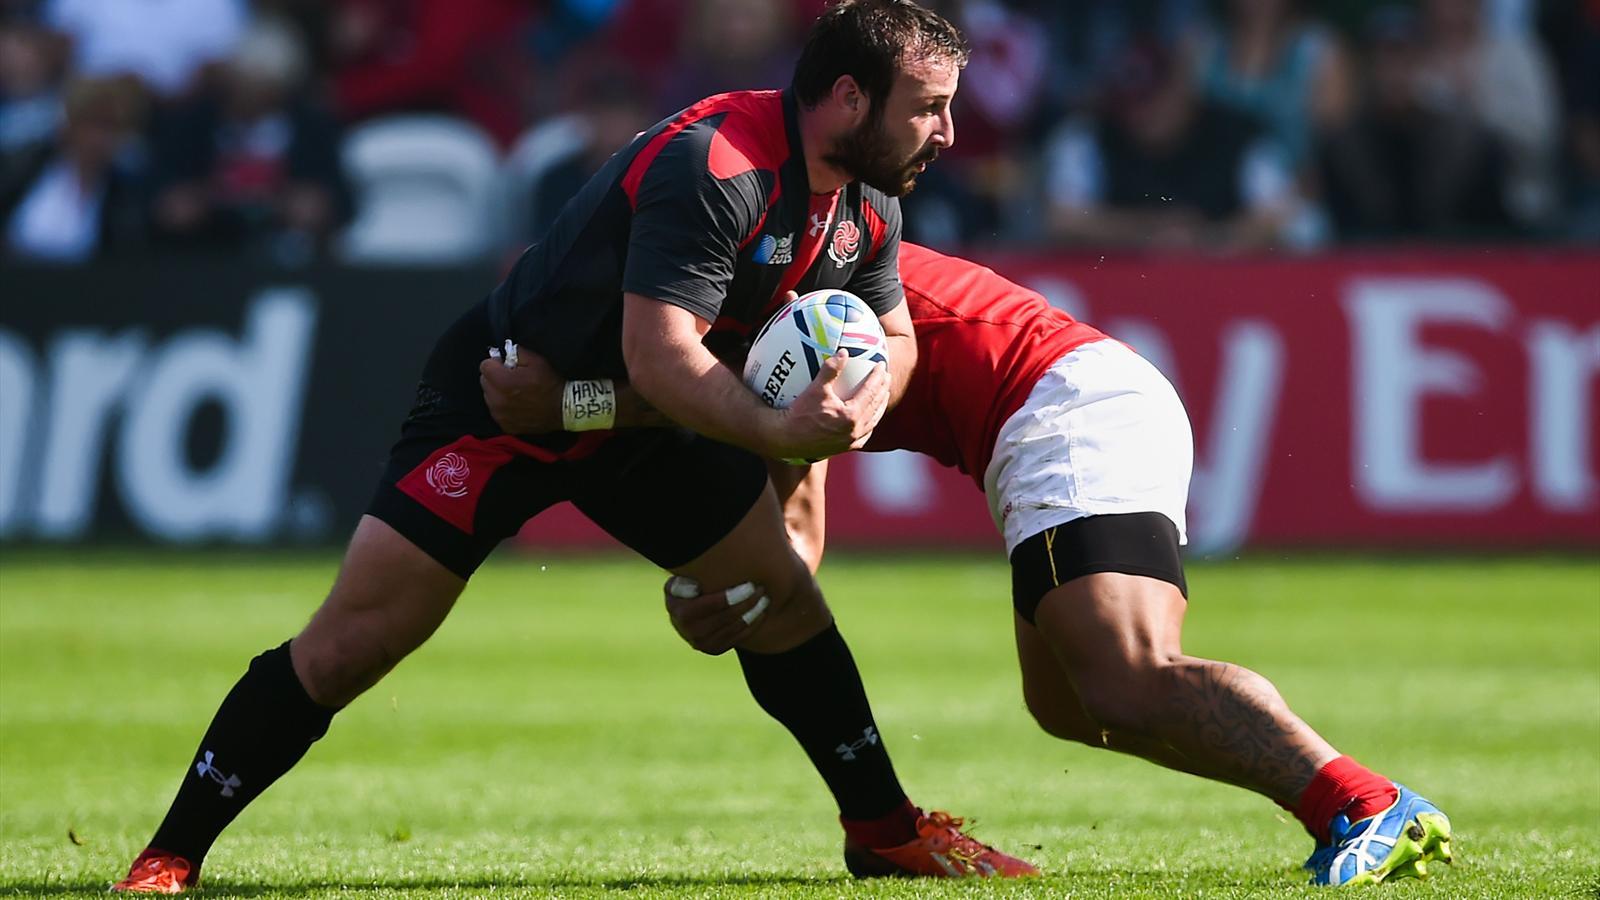 Live irlande canada 1er tour coupe du monde 2015 rugby eurosport live score - Score coupe du monde de rugby 2015 ...